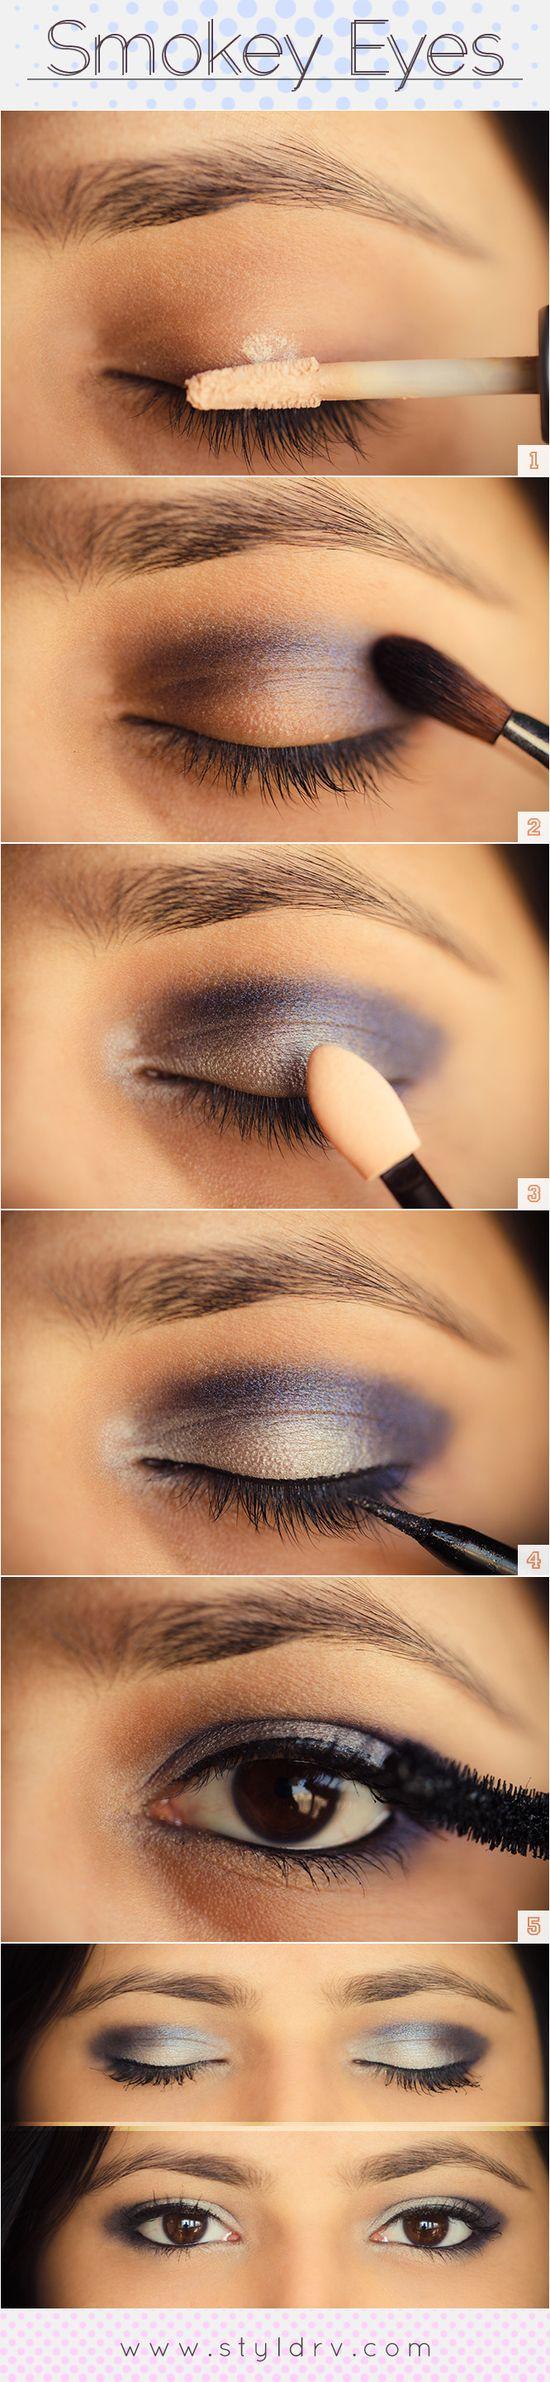 How to do a smokey eye